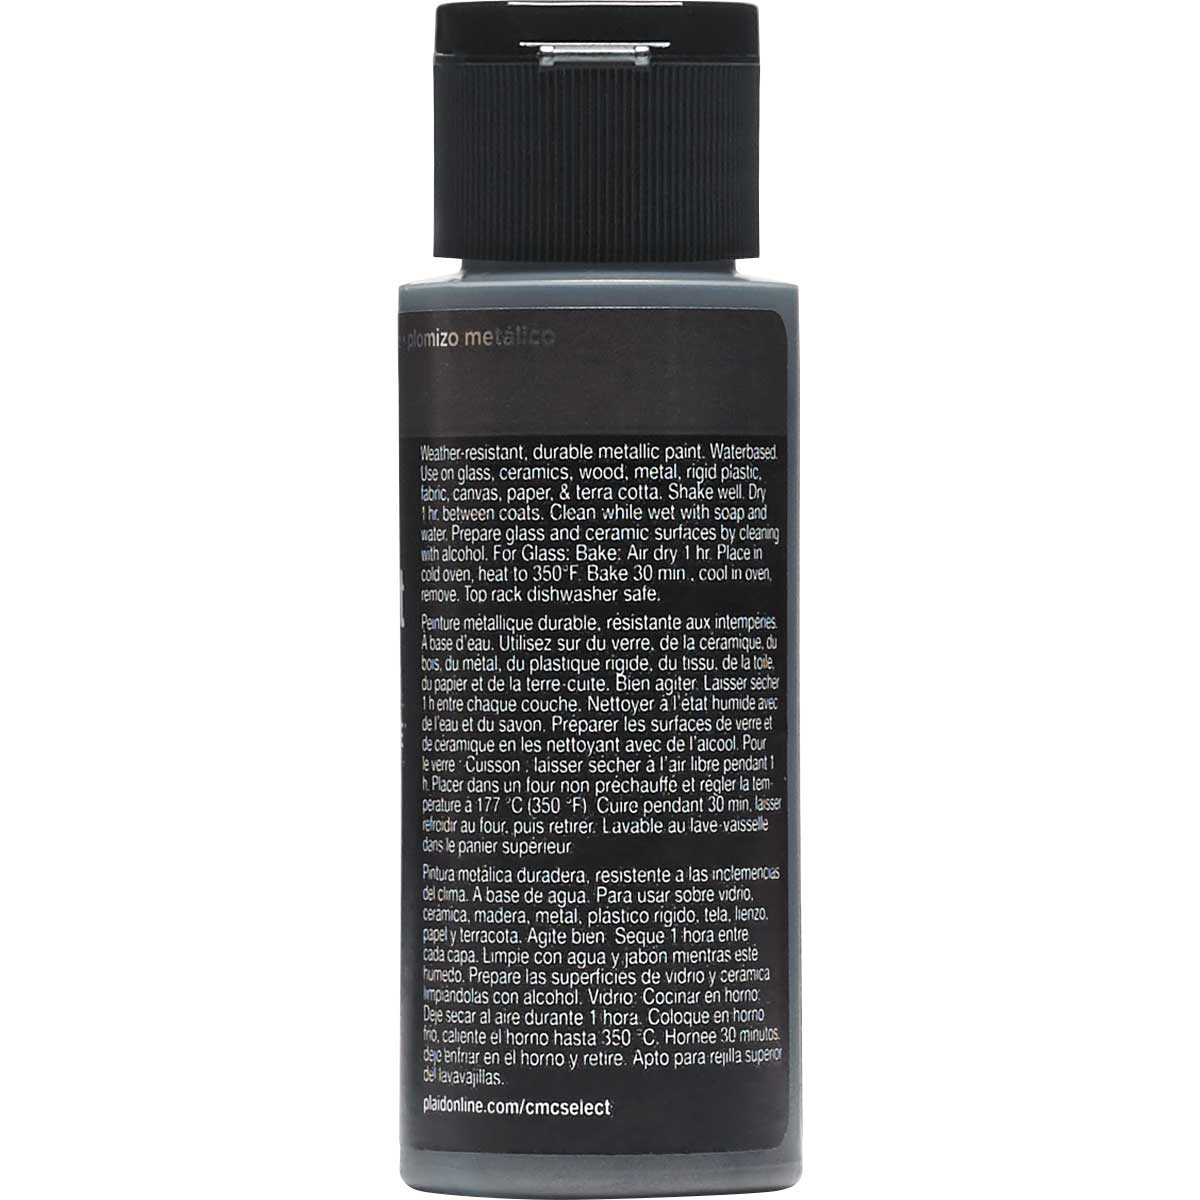 Delta Ceramcoat ® Select Multi-Surface Acrylic Paint - Metallic - Gunmetal, 2 oz. - 04113